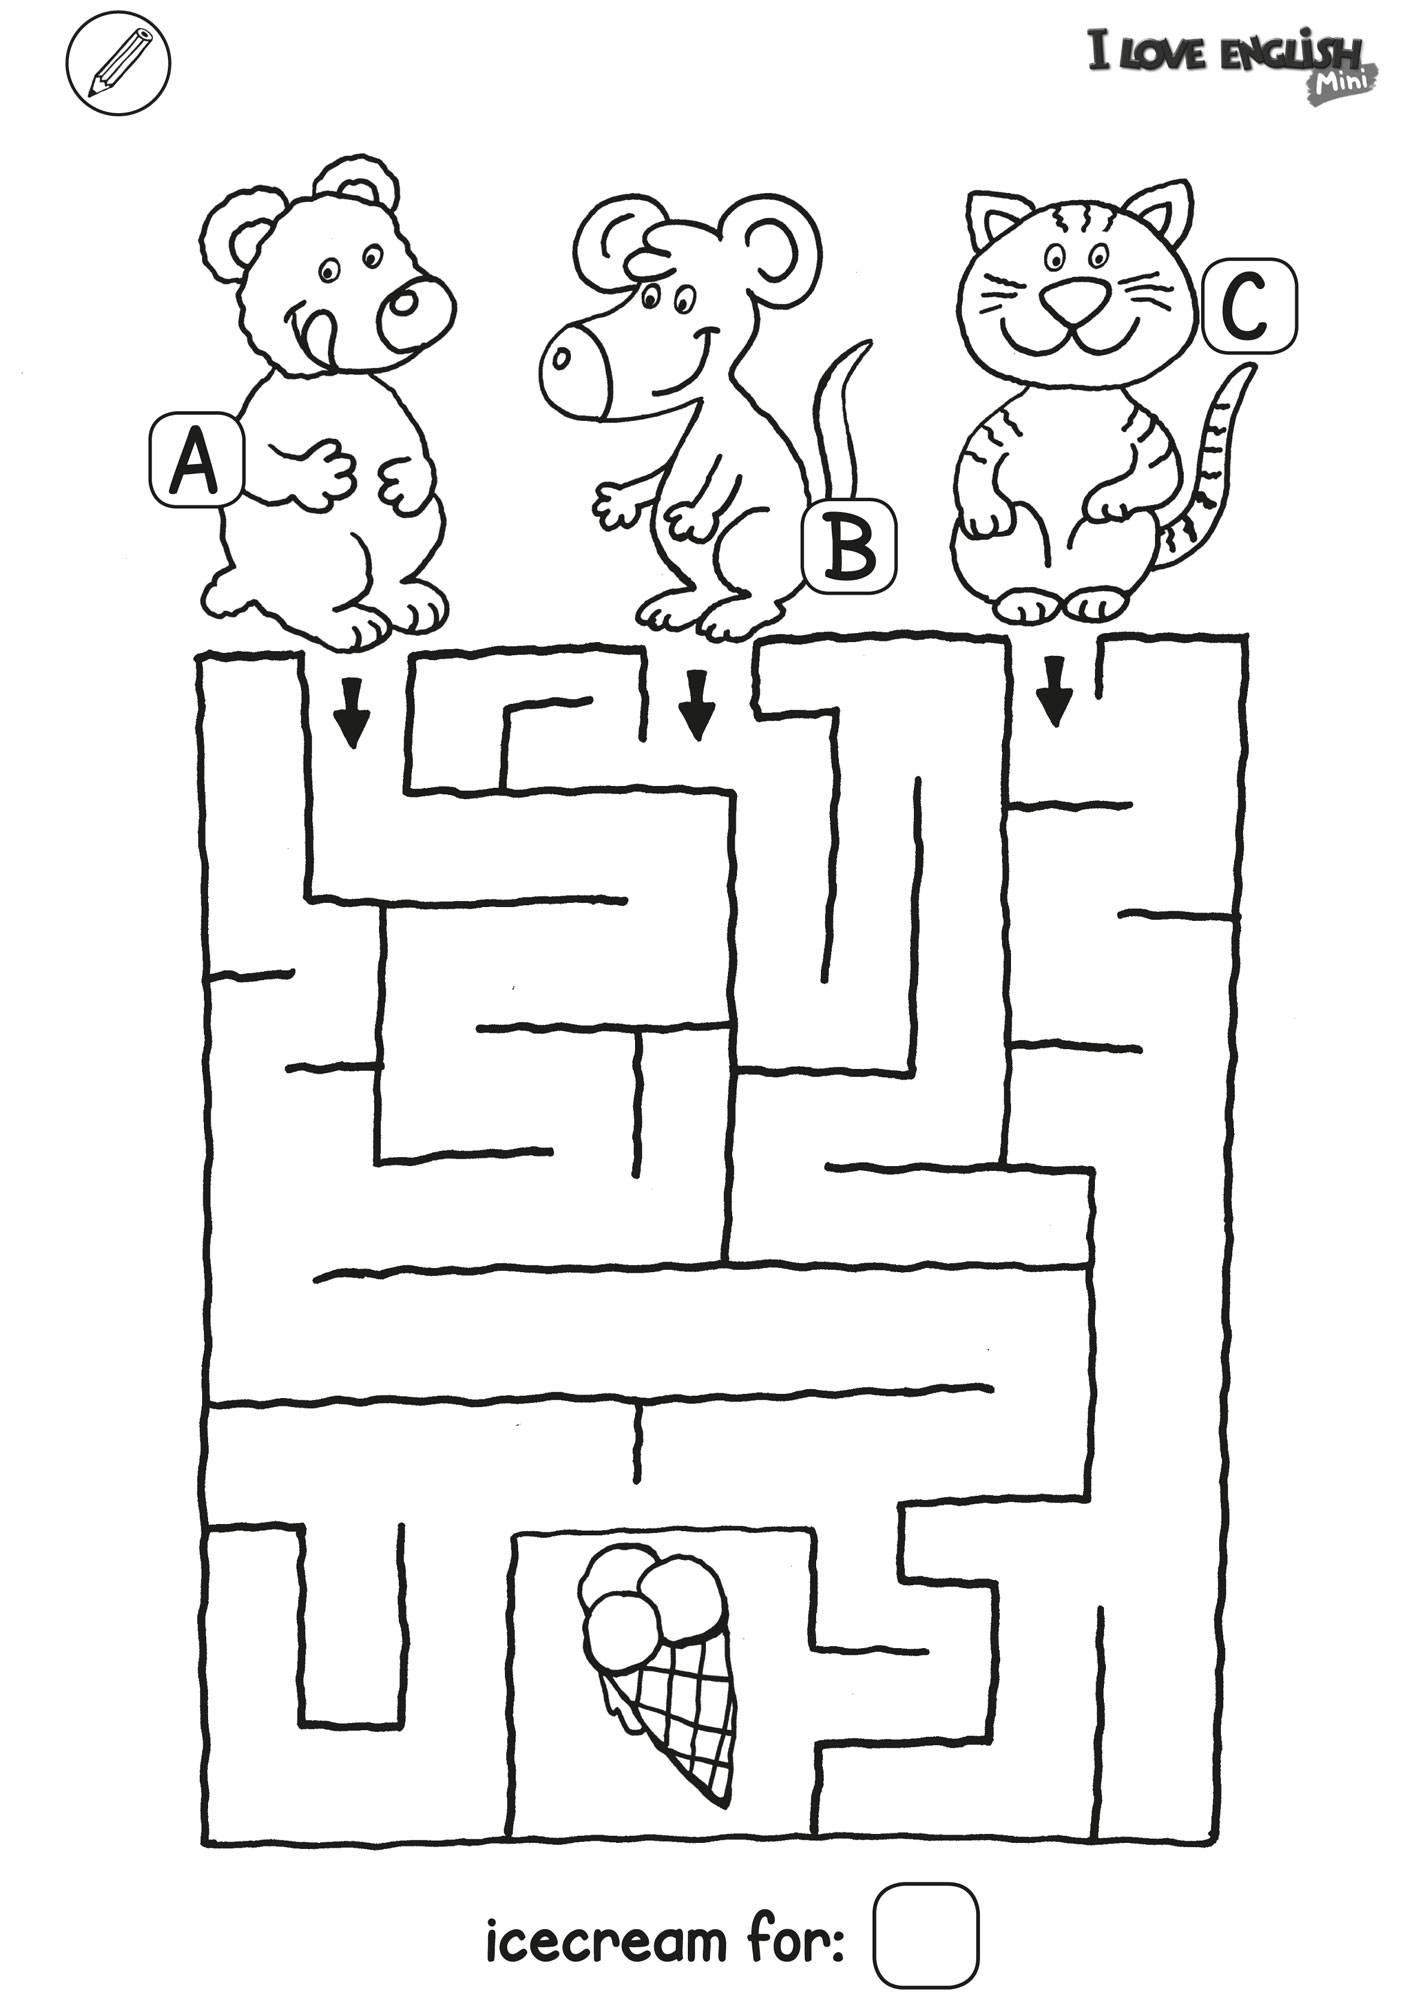 i love english mini labyrinth  eis